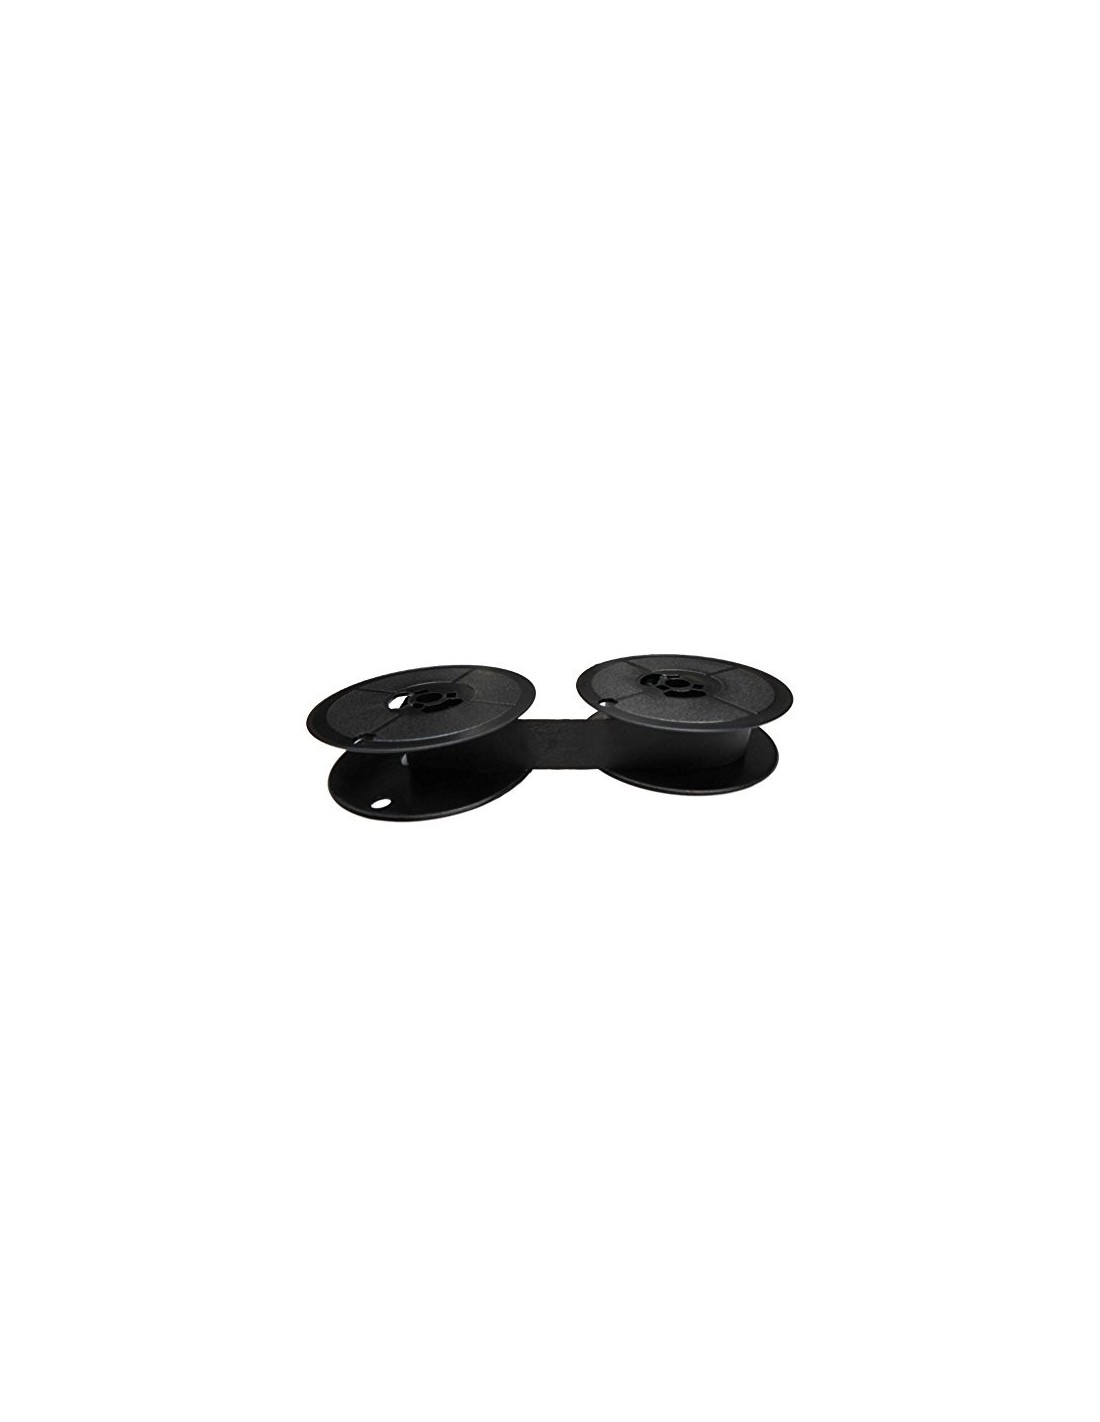 Carbon Kores Farbband f/Ã/¼r olivetti ET 2200 schwarz